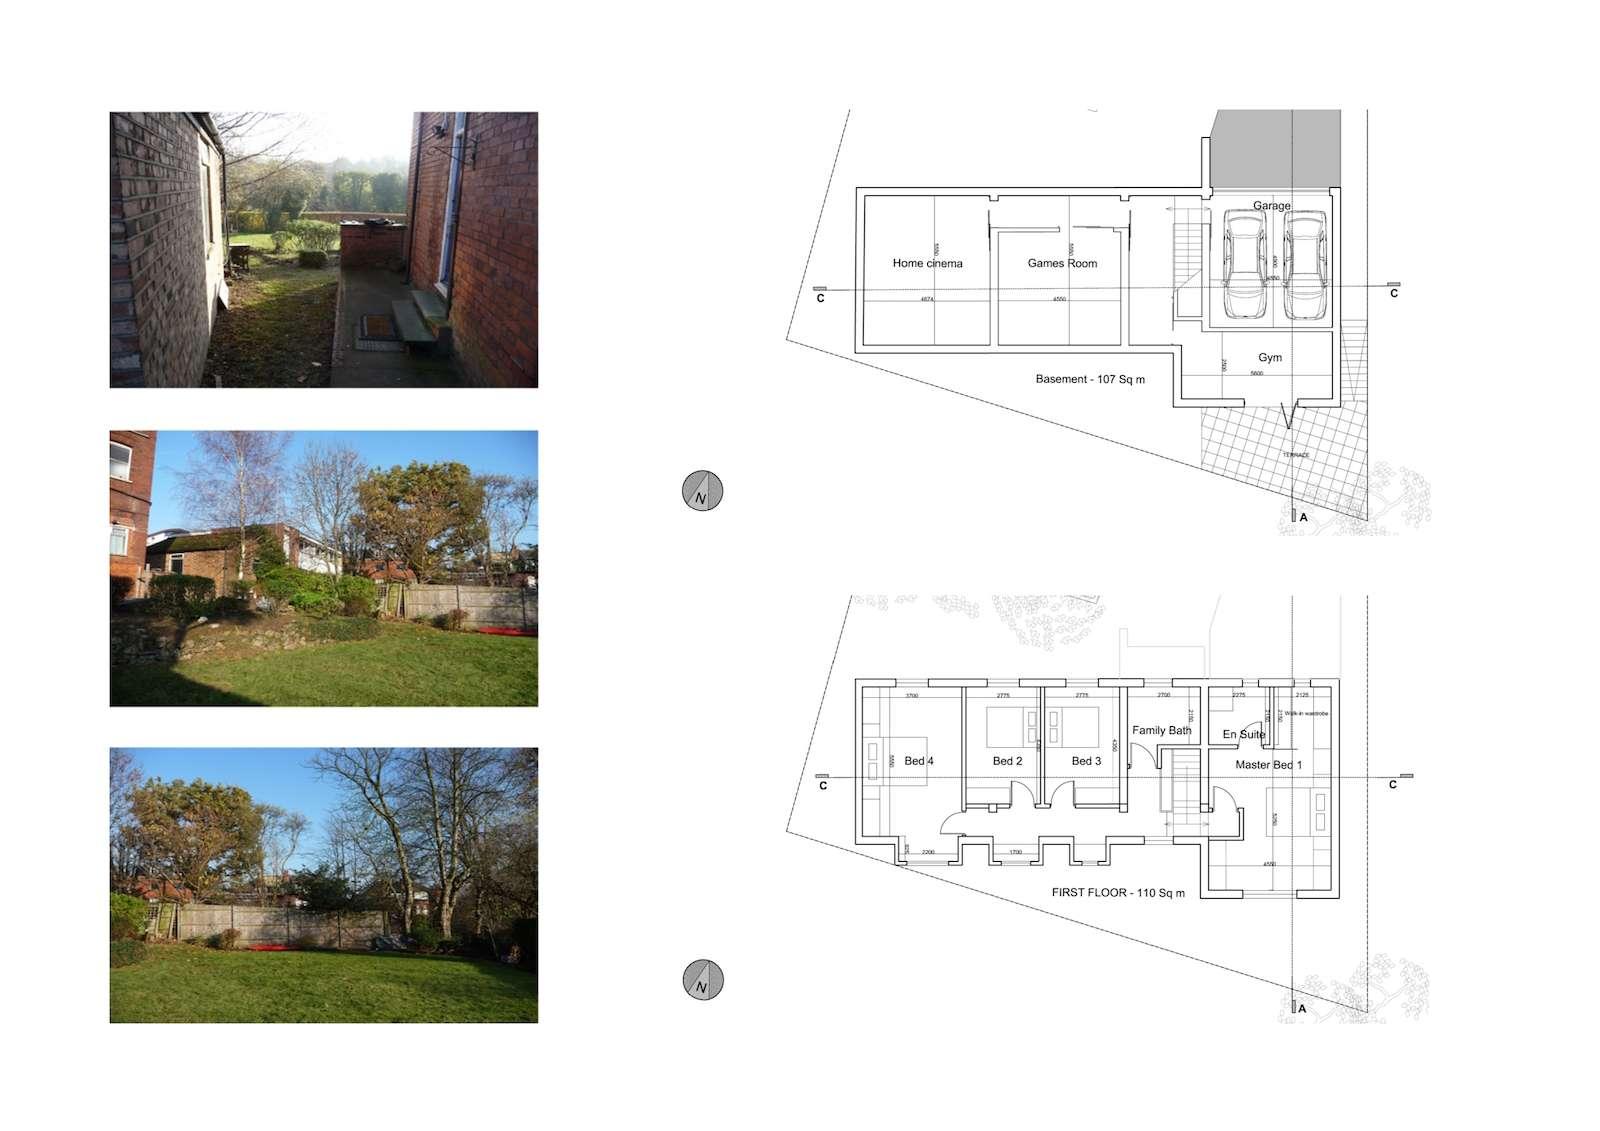 04 Highgate Haringey N6 House development Upper floor plans Highgate I, Haringey N6 | Residential property development